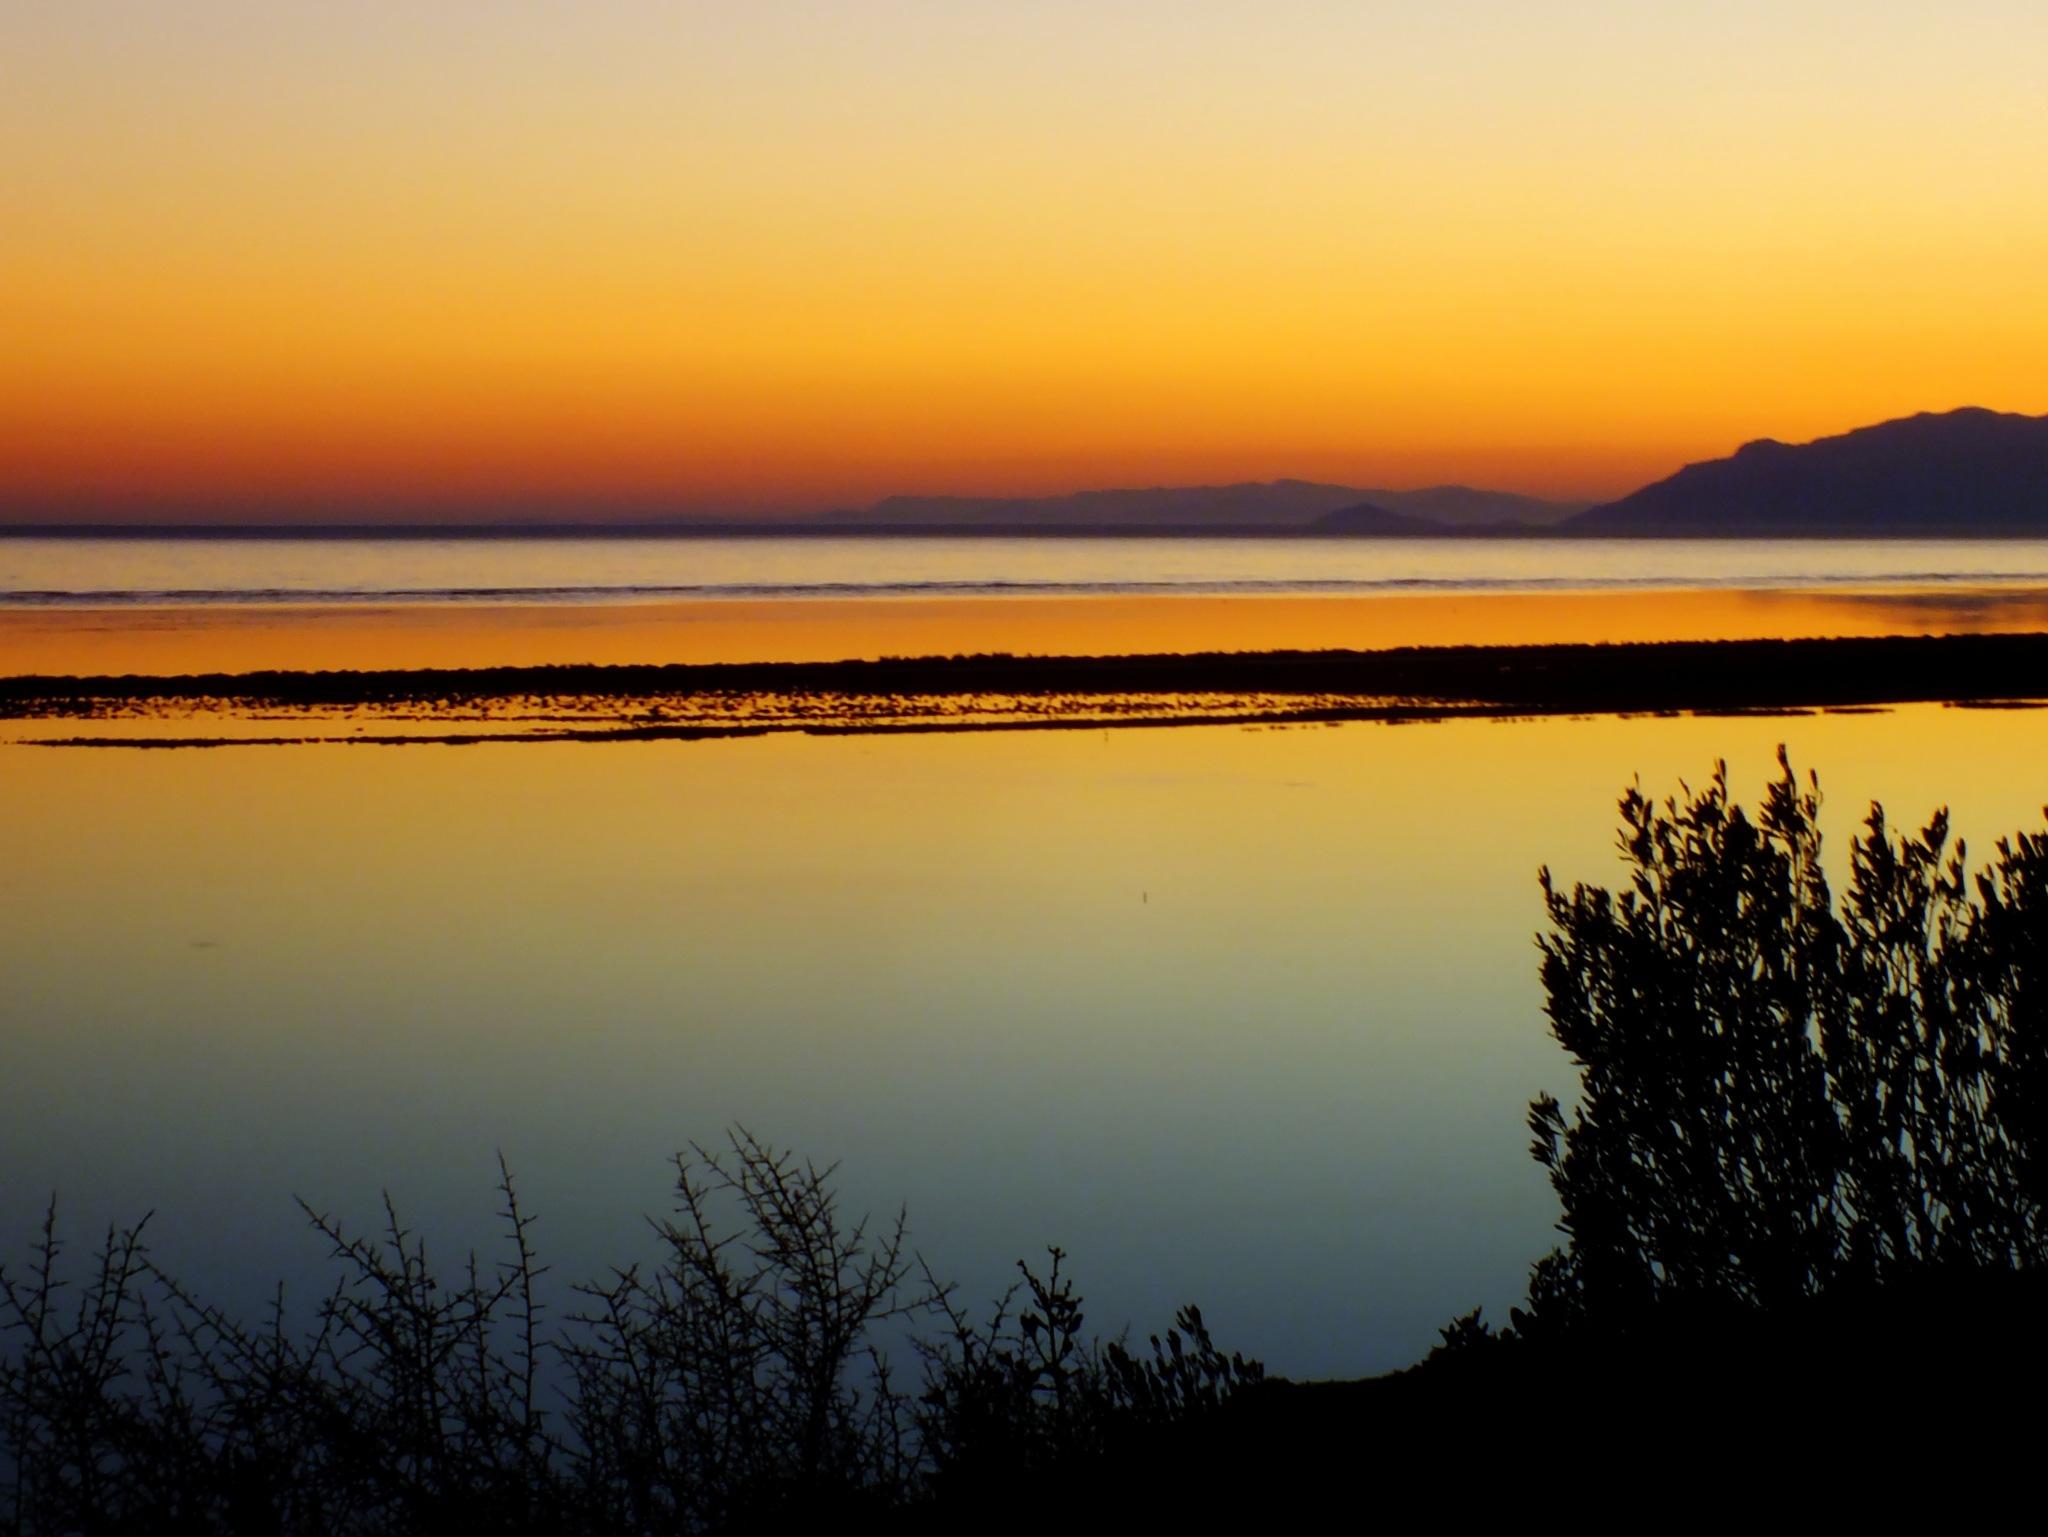 NEHİR VE DENİZ (River & Sea) by nedim alkan